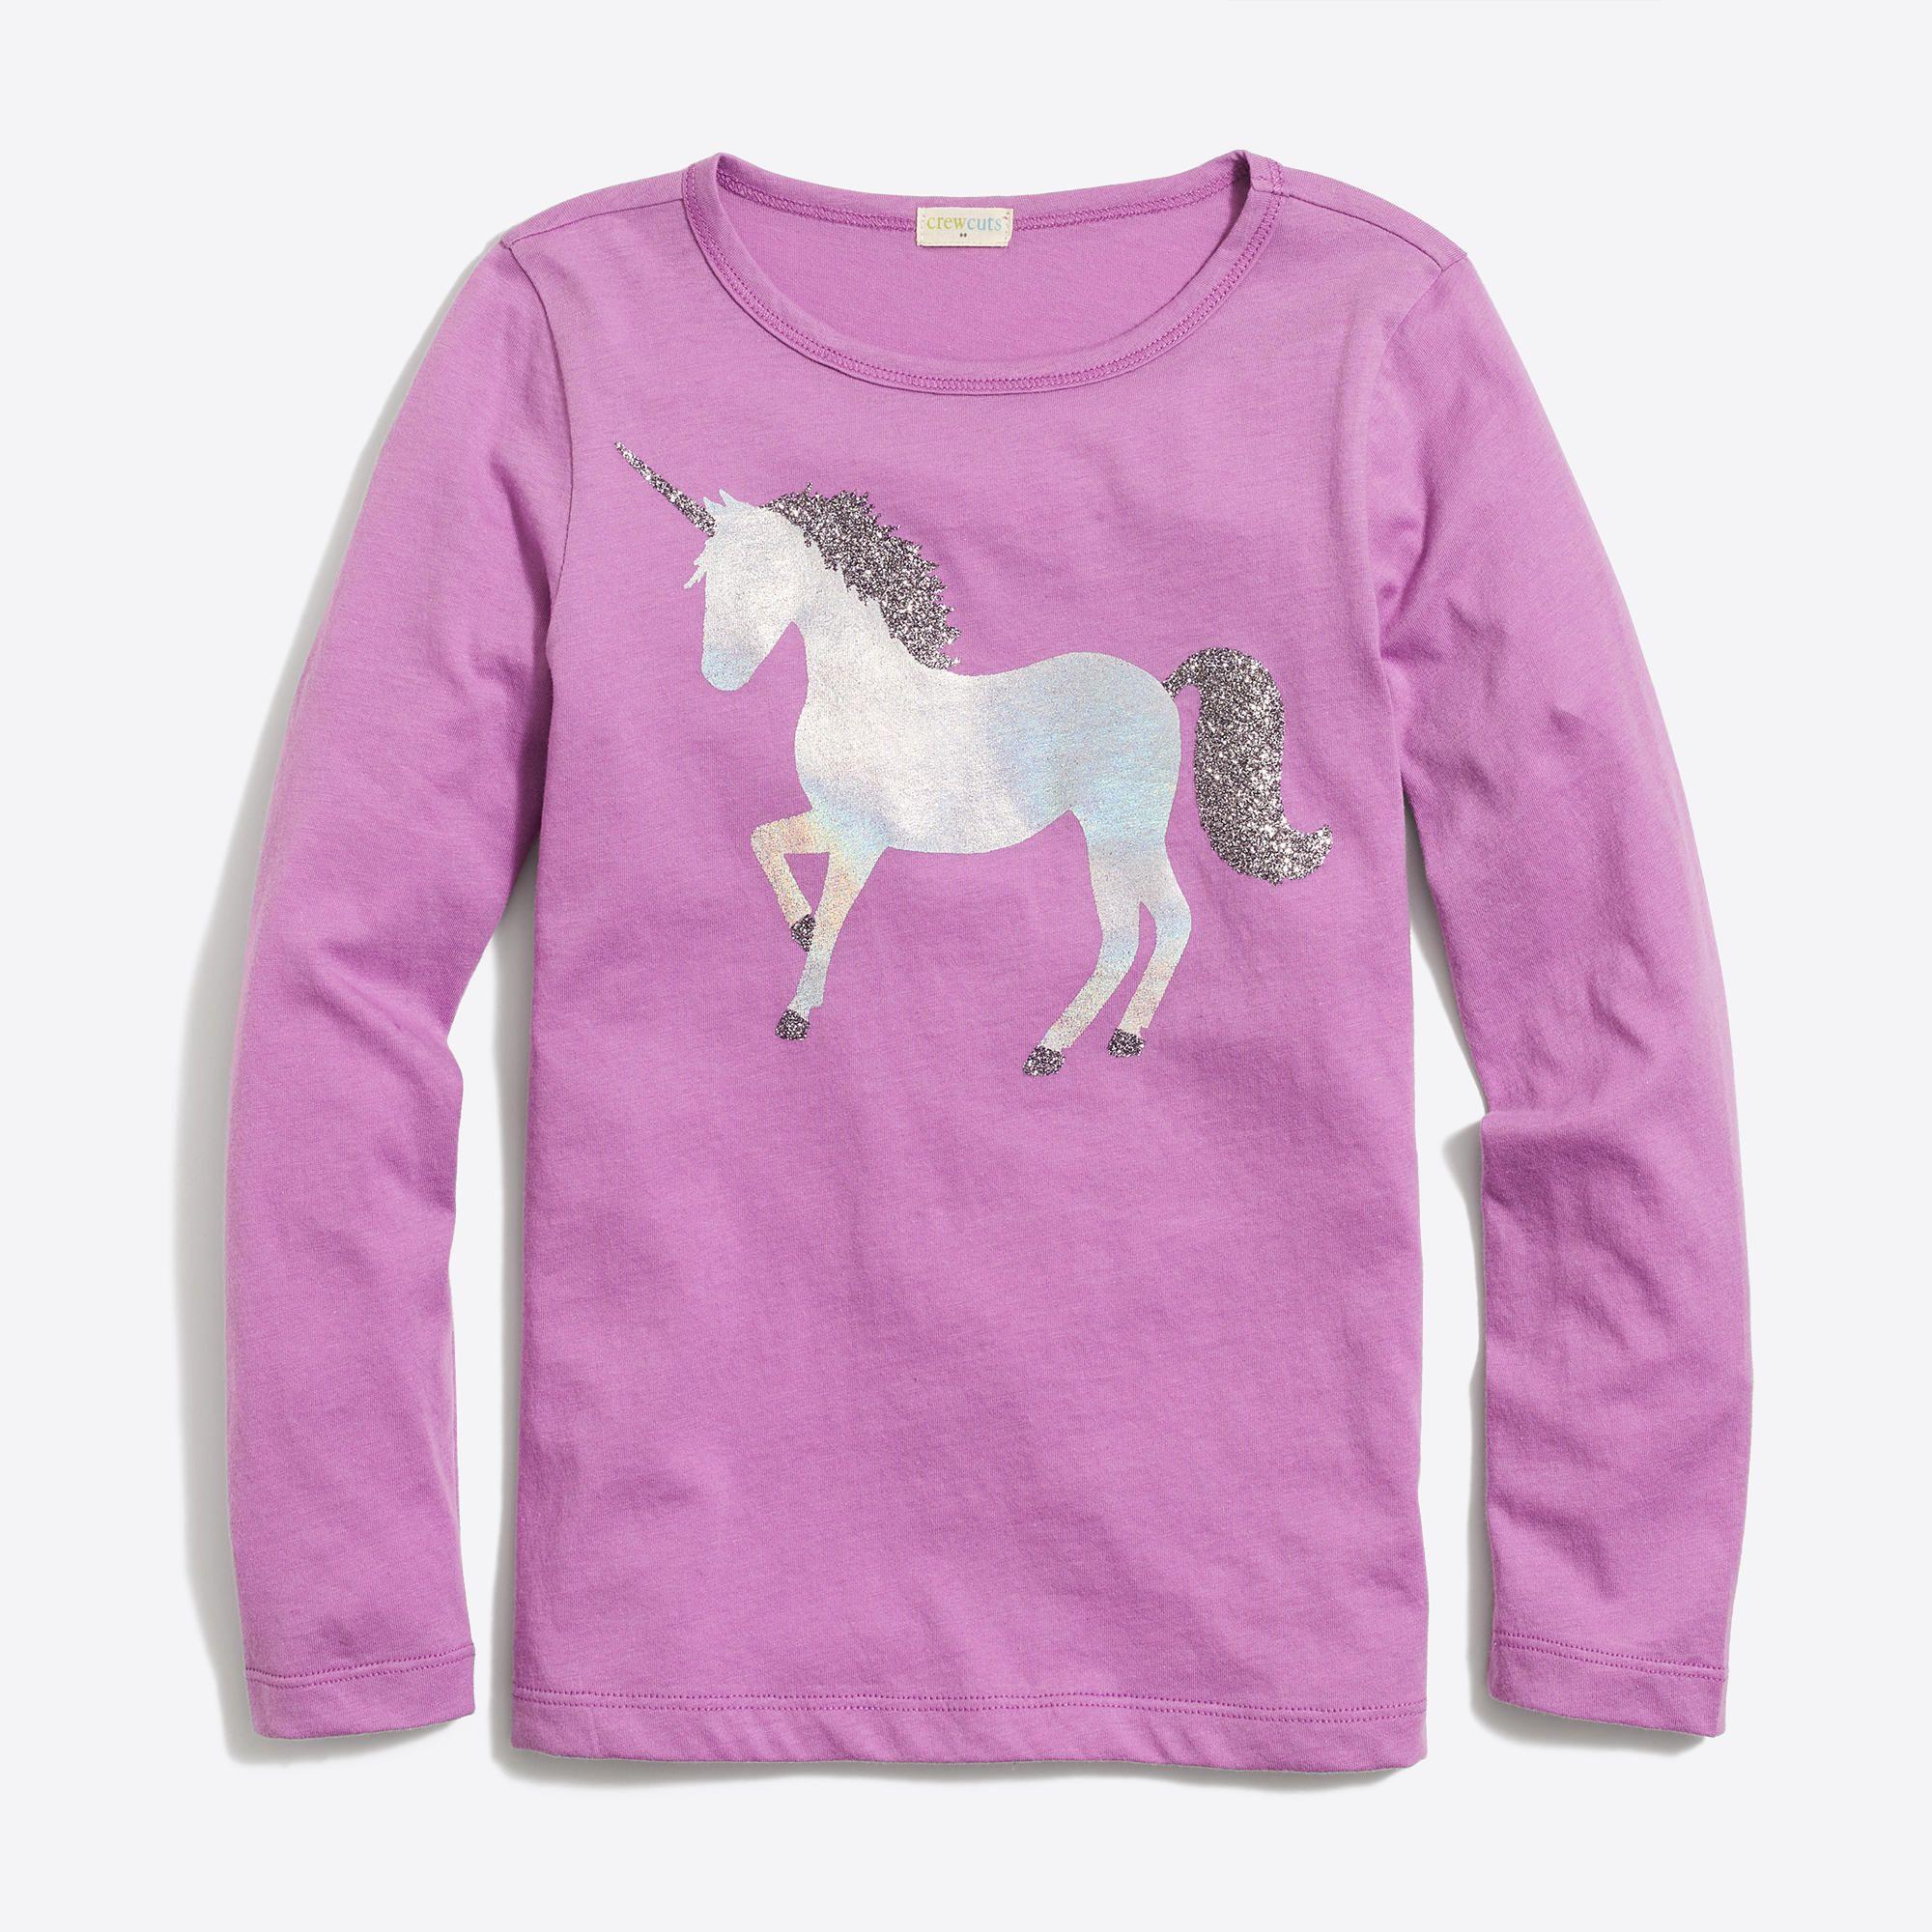 b9fbb831 J.Crew - Girls' long-sleeve unicorn keepsake T-shirt | AVR | Unicorn ...